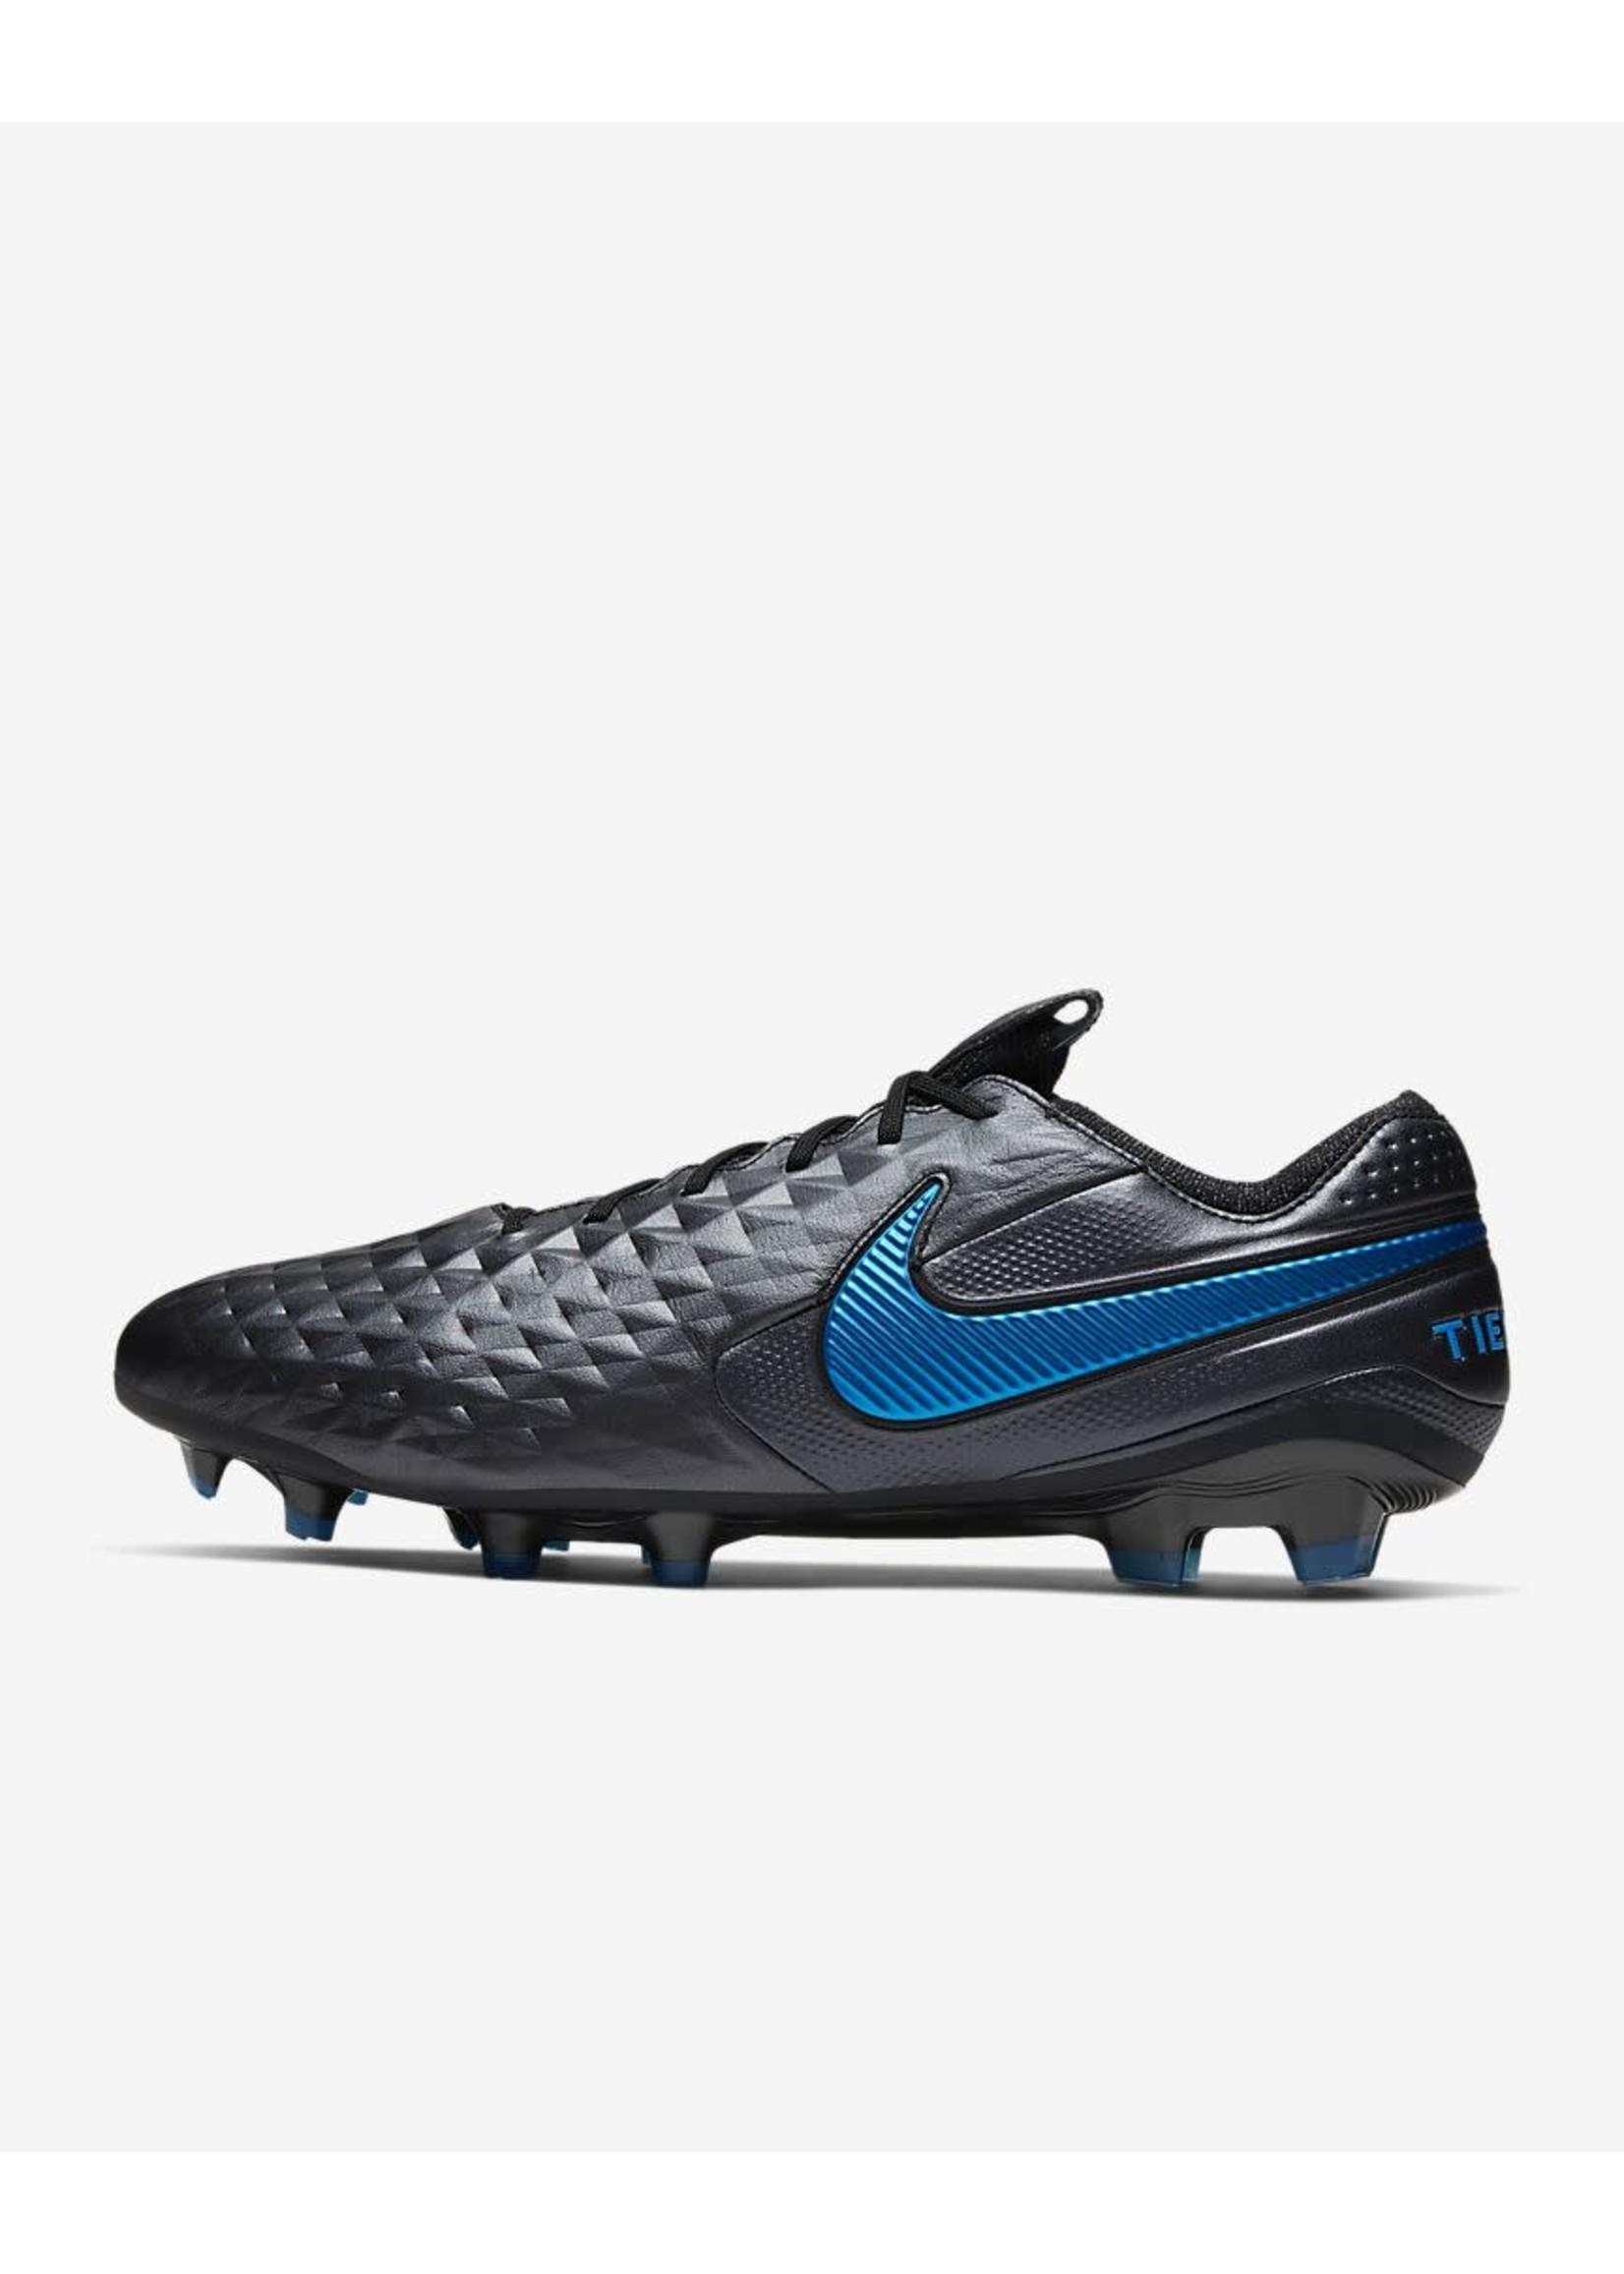 Nike Legend 8 Elite FG - Grey/Blue